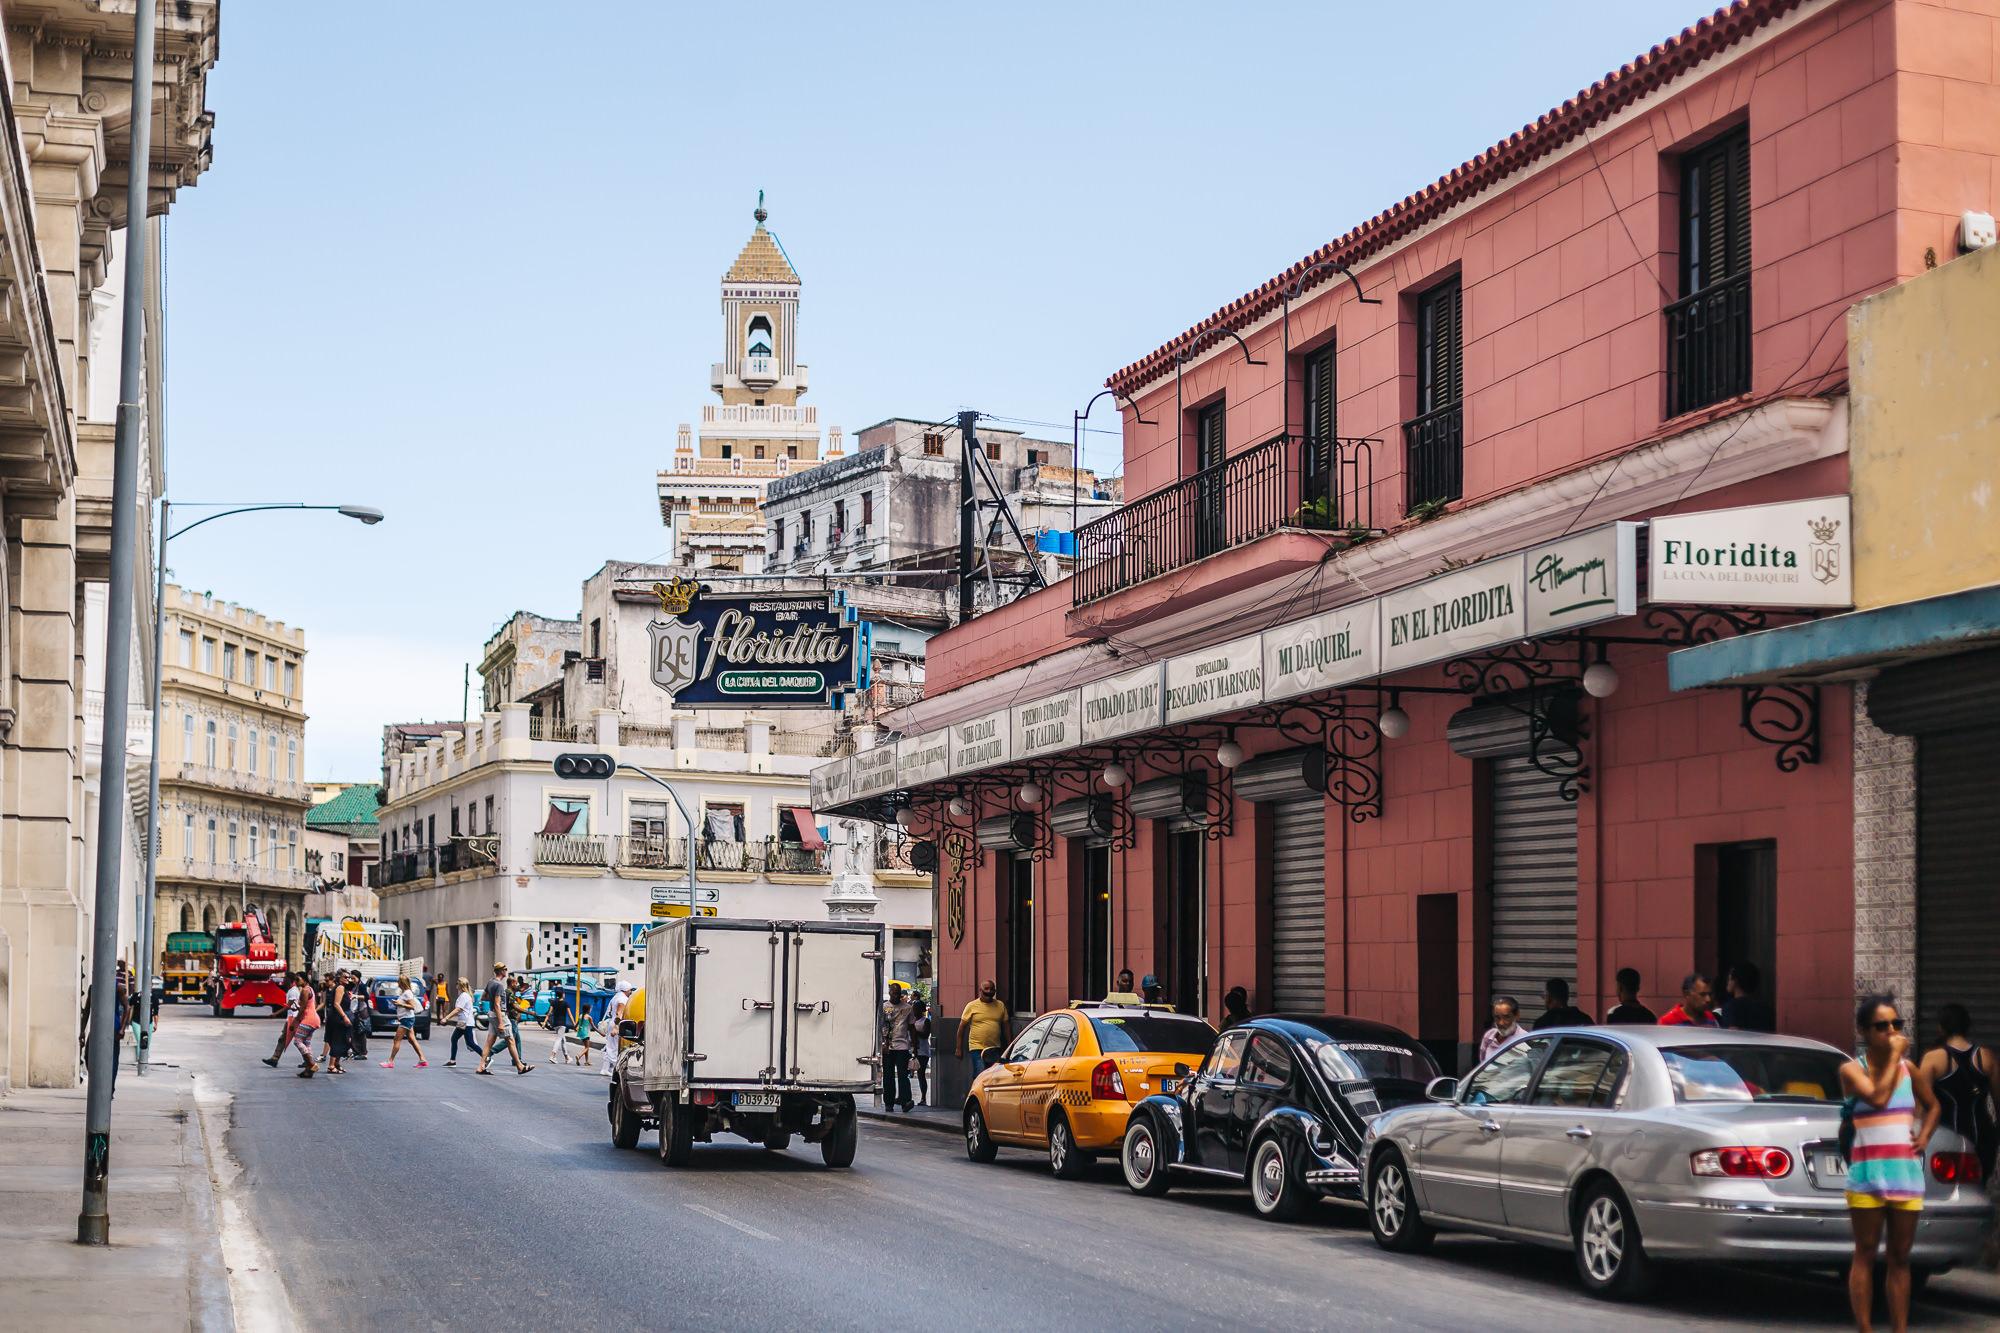 Floridita on the corner of Obispo and Monserrate streets